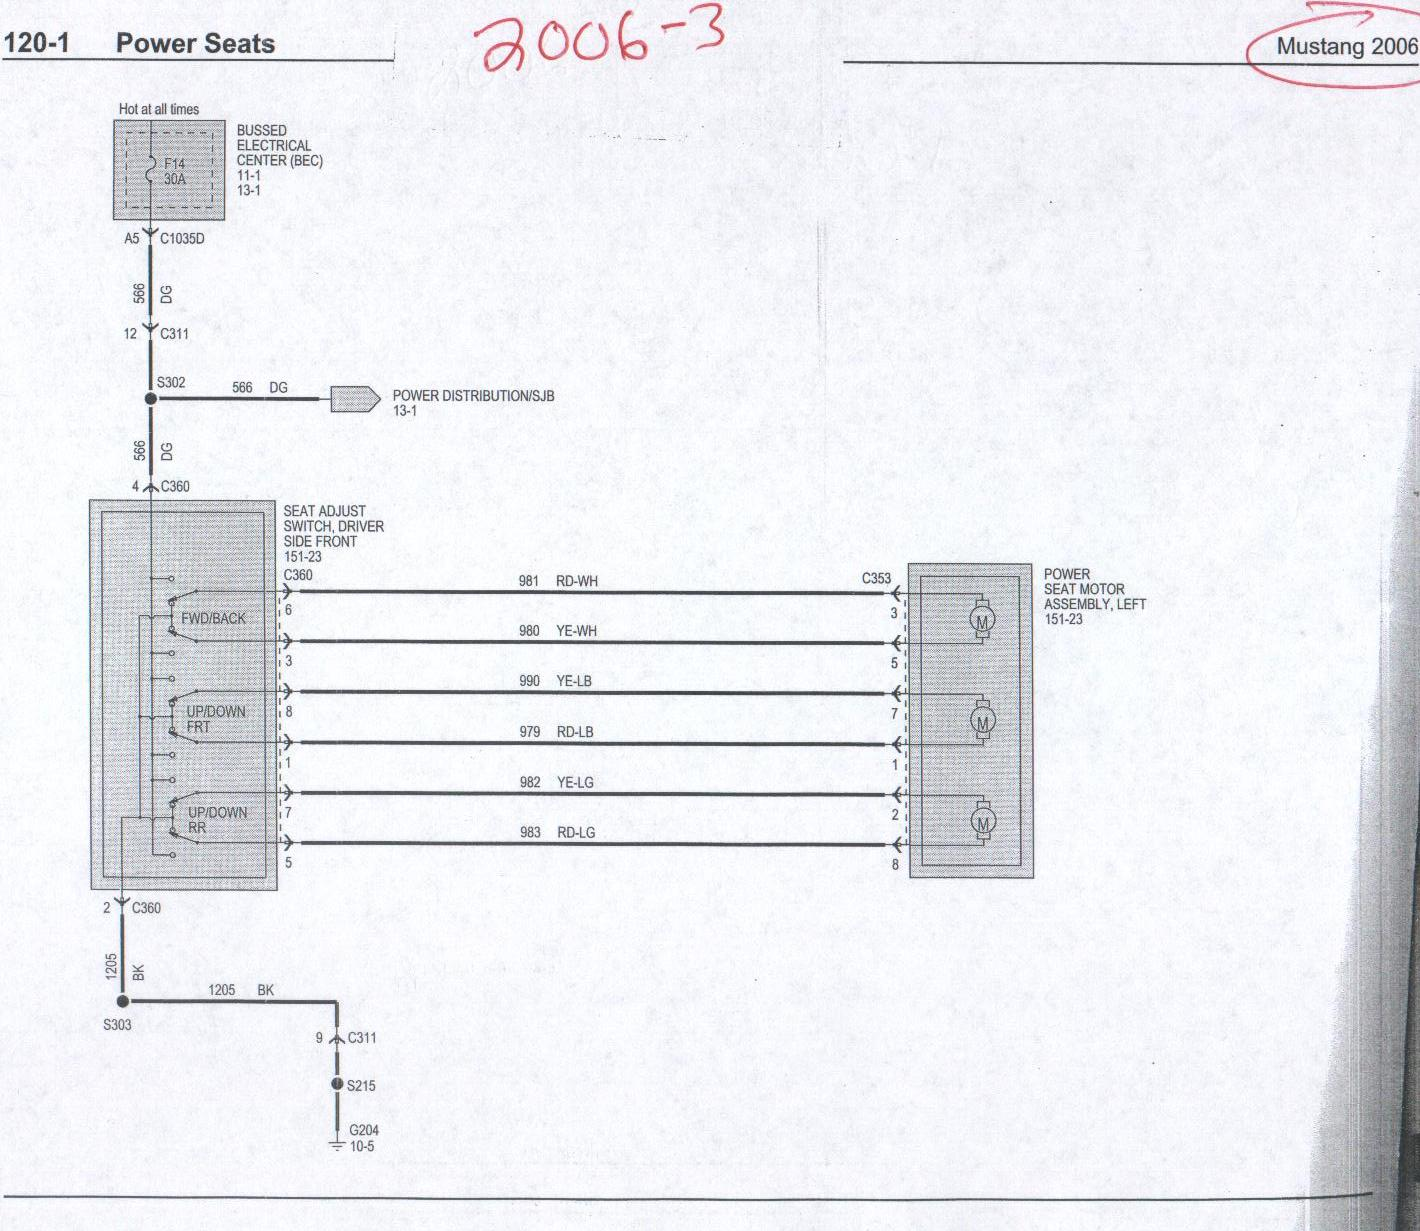 OM_0104] 2005 Mustang Power Seat Wiring Diagrams Schematic WiringUsnes Cajos Mohammedshrine Librar Wiring 101